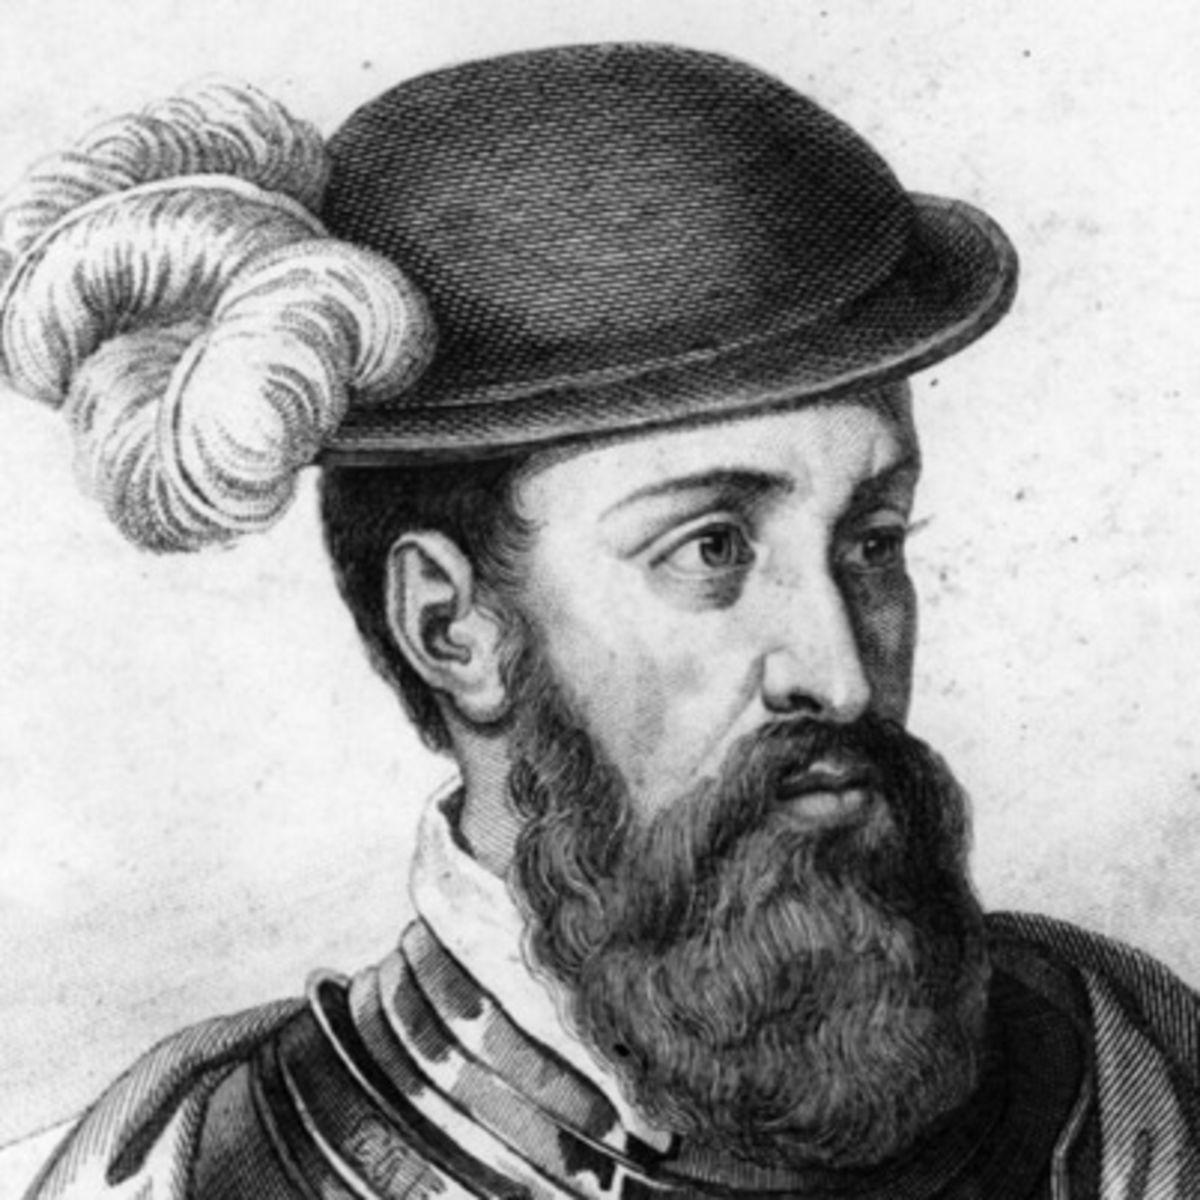 Francisco Pizarro, Peru topraklarını ele geçiren ispanyol(DY-1475) tarihte bugün